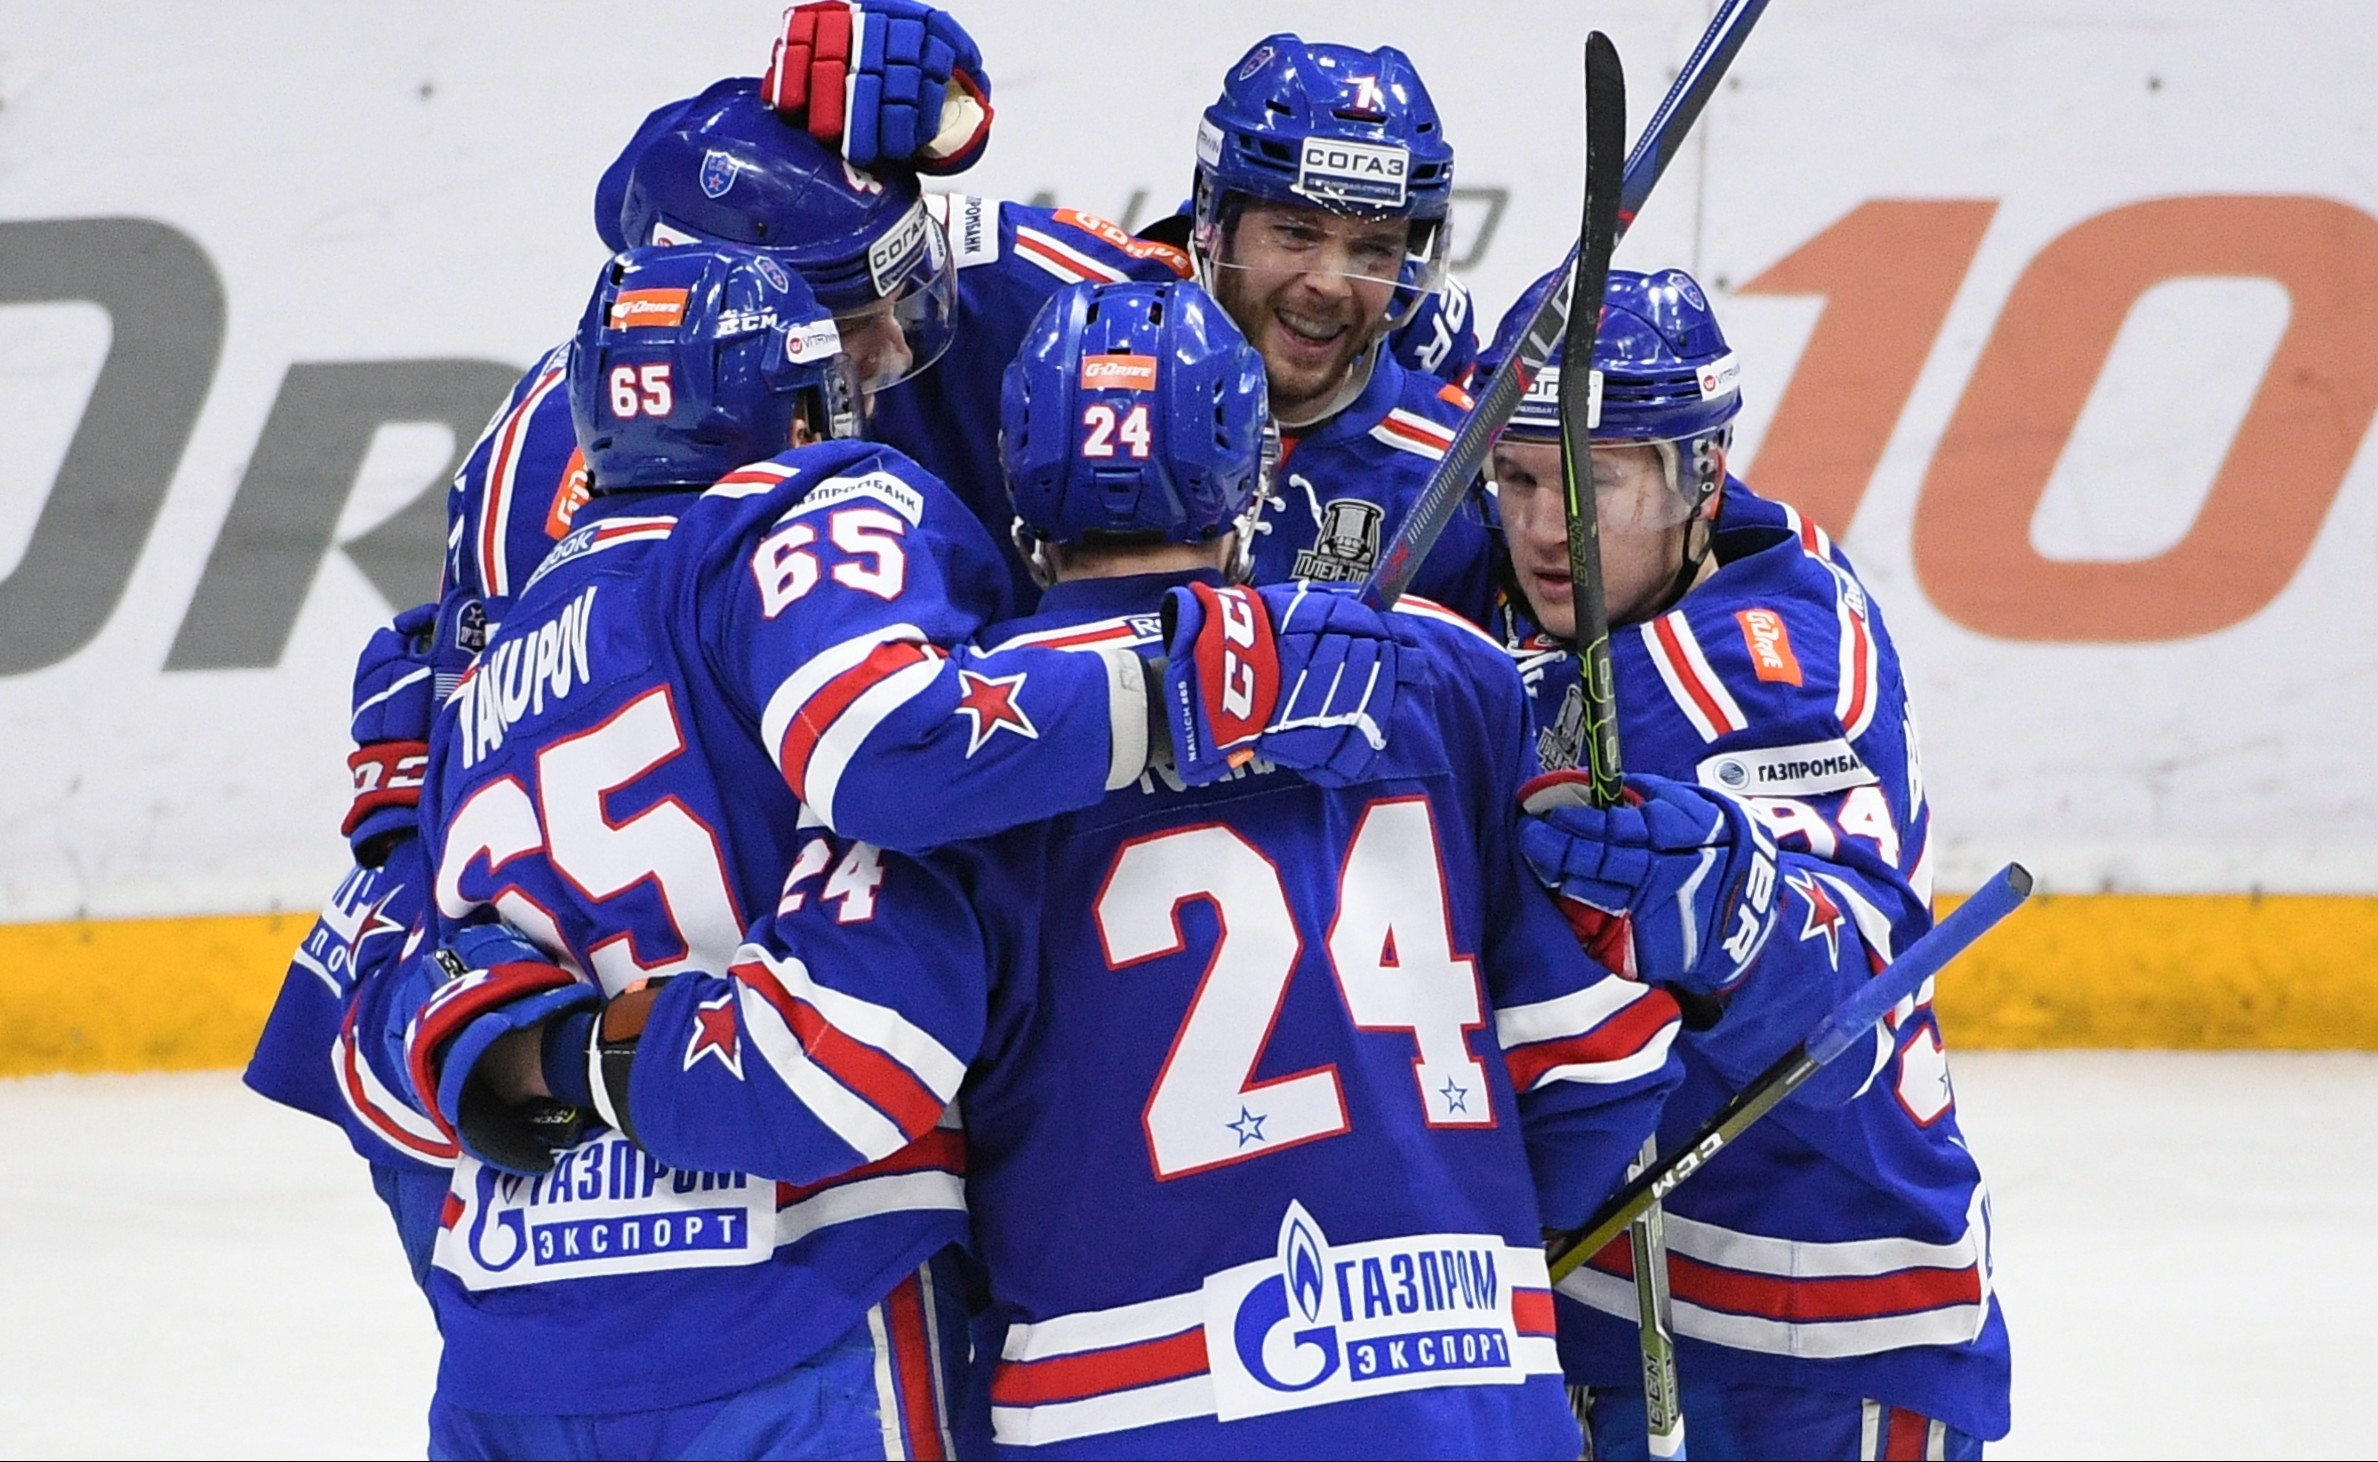 <p>Фото: © РИА Новости/Алексей Даничев</p>